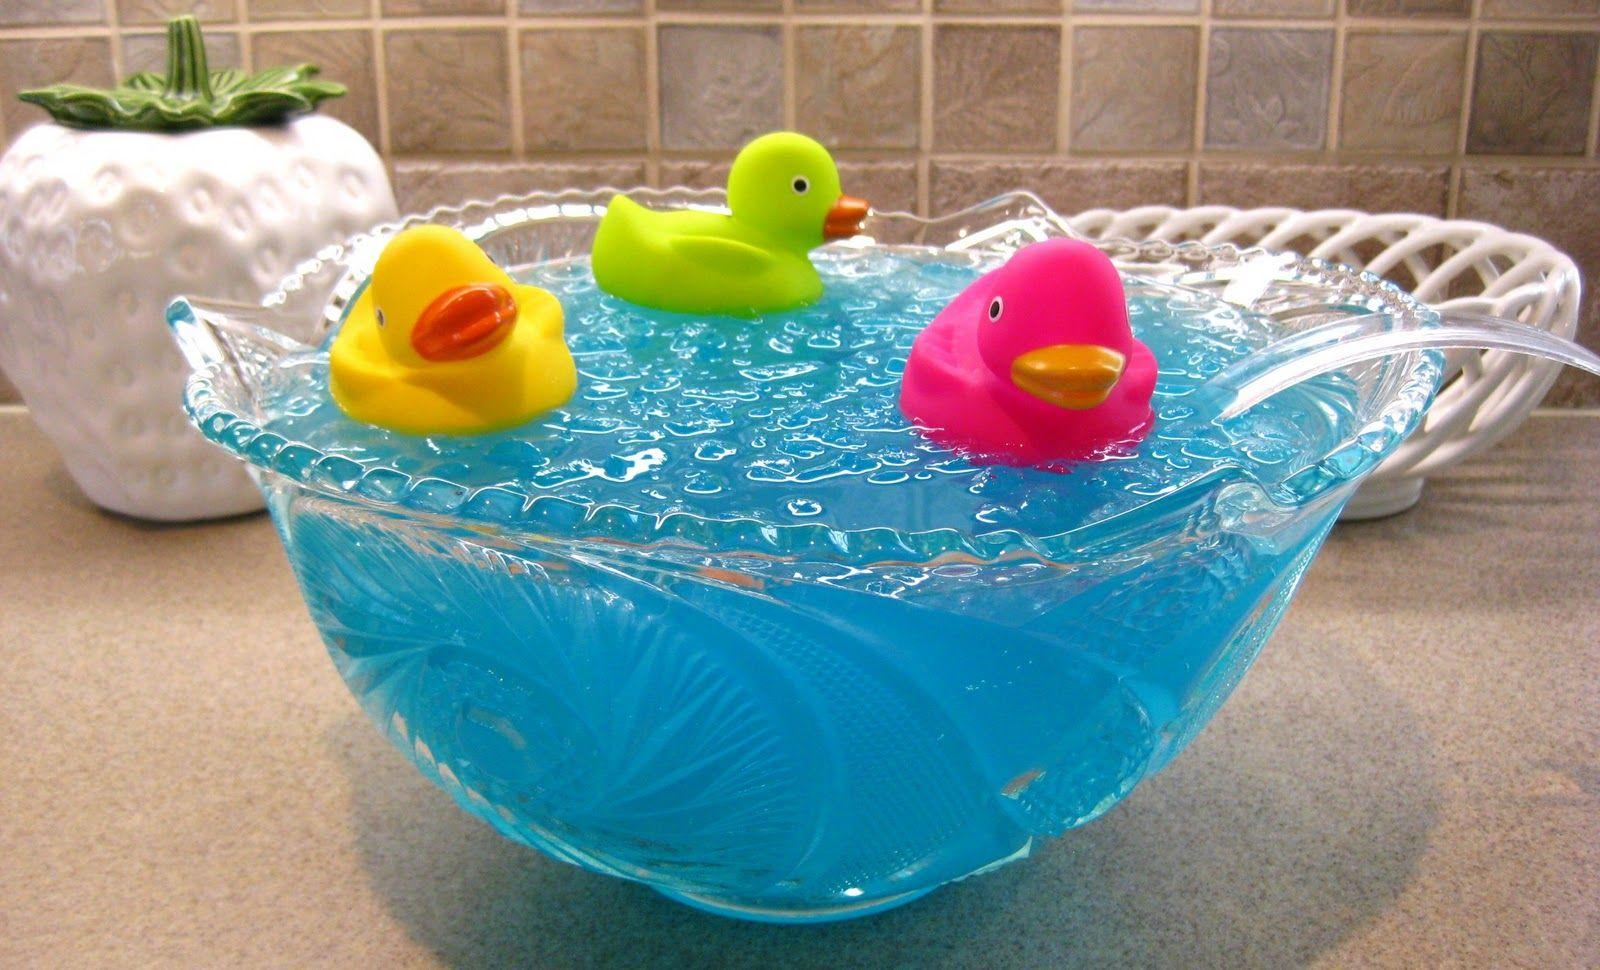 Ducky Bath Baby Shower Punch ducky bath baby shower punch | recipe | rubber ducky punch, babies